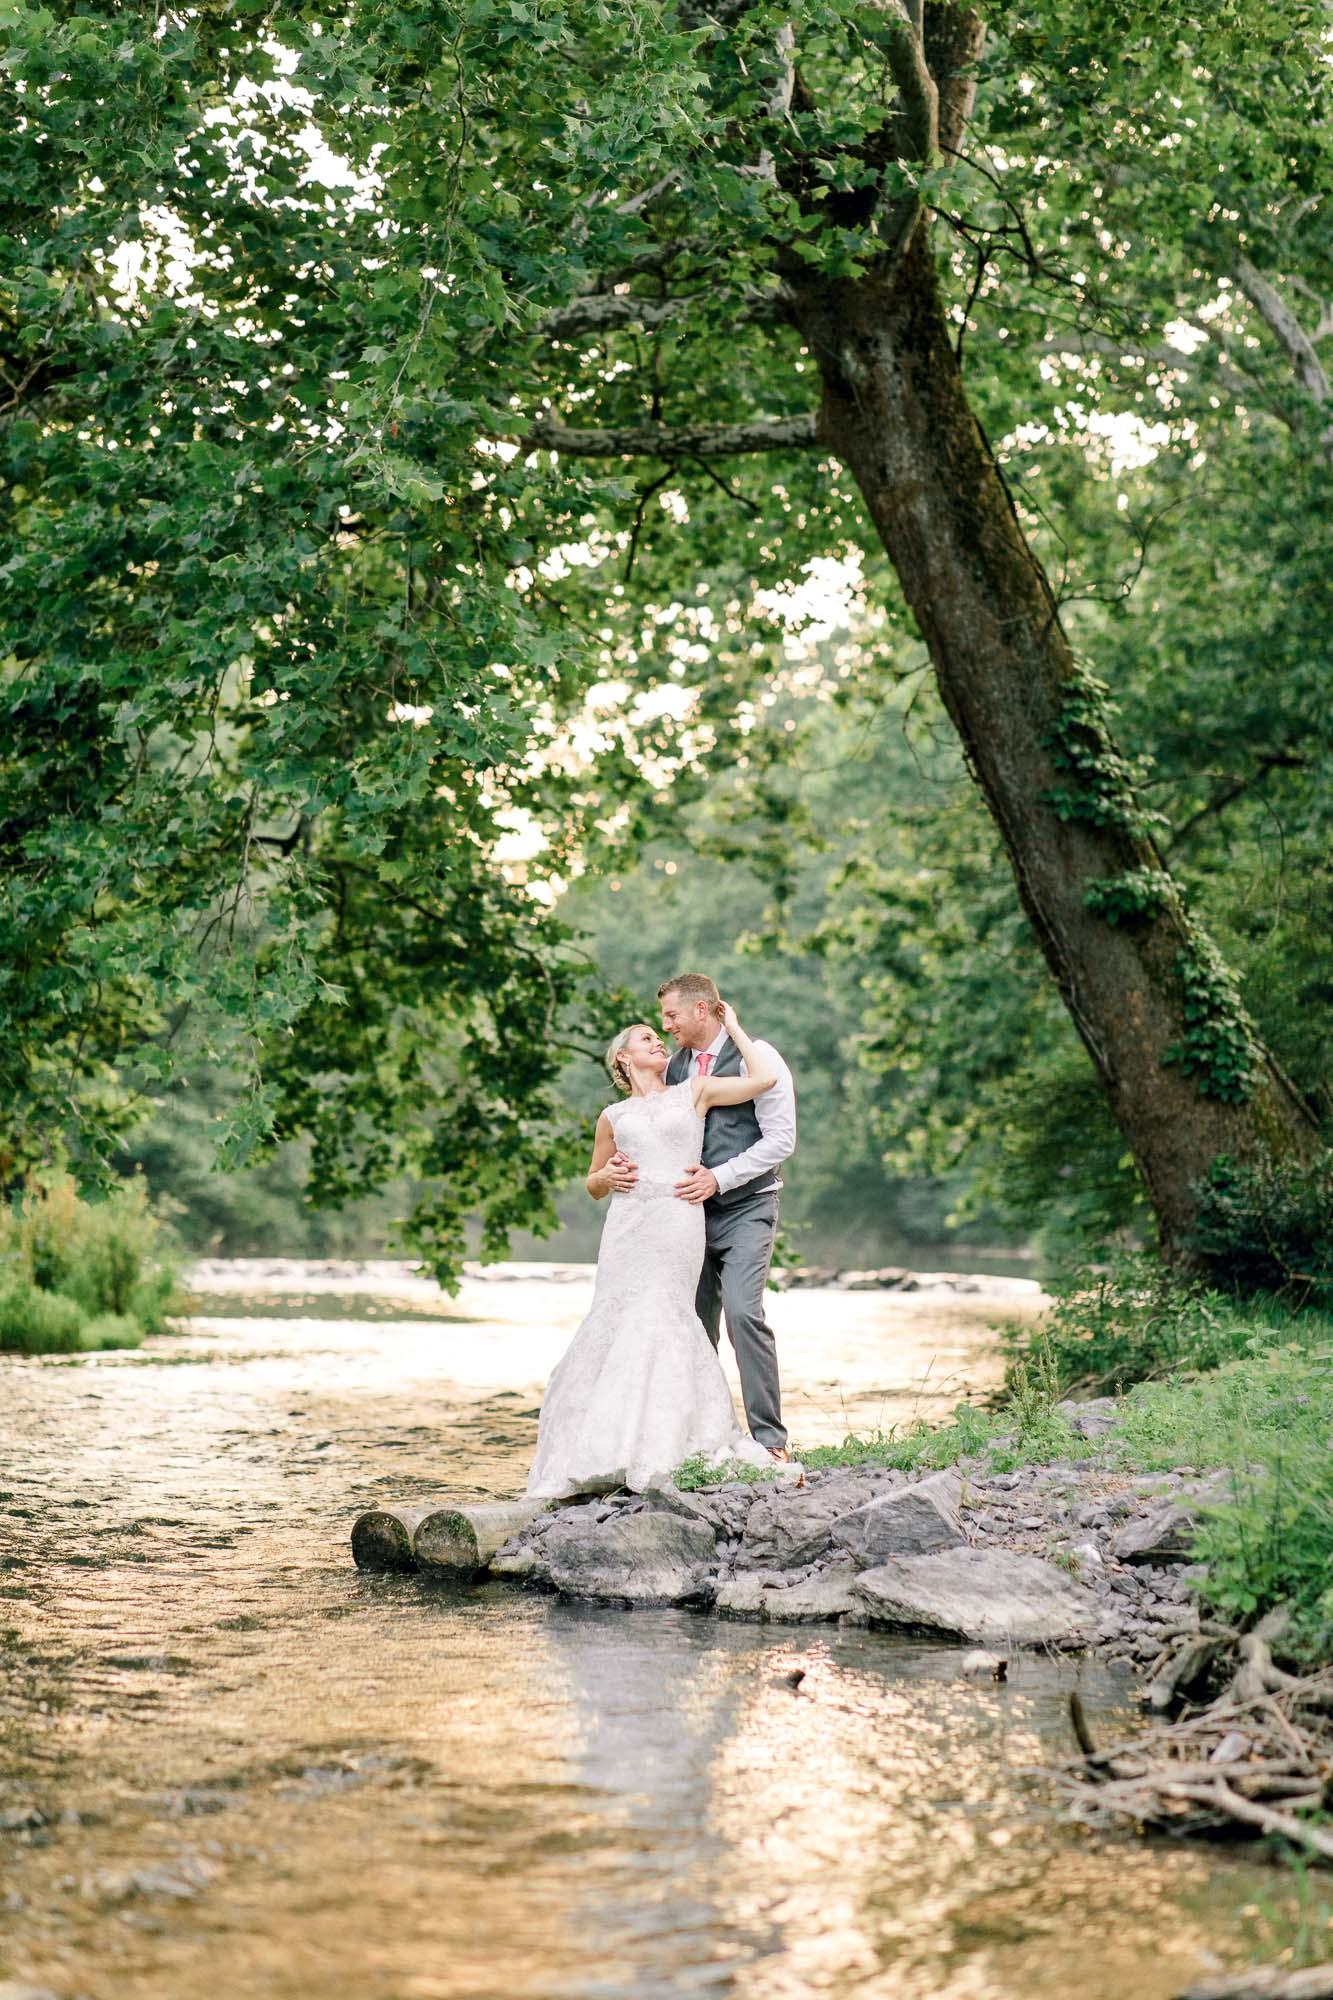 Allenberry-resort-historic-pennsylvania-wedding-22499.jpg